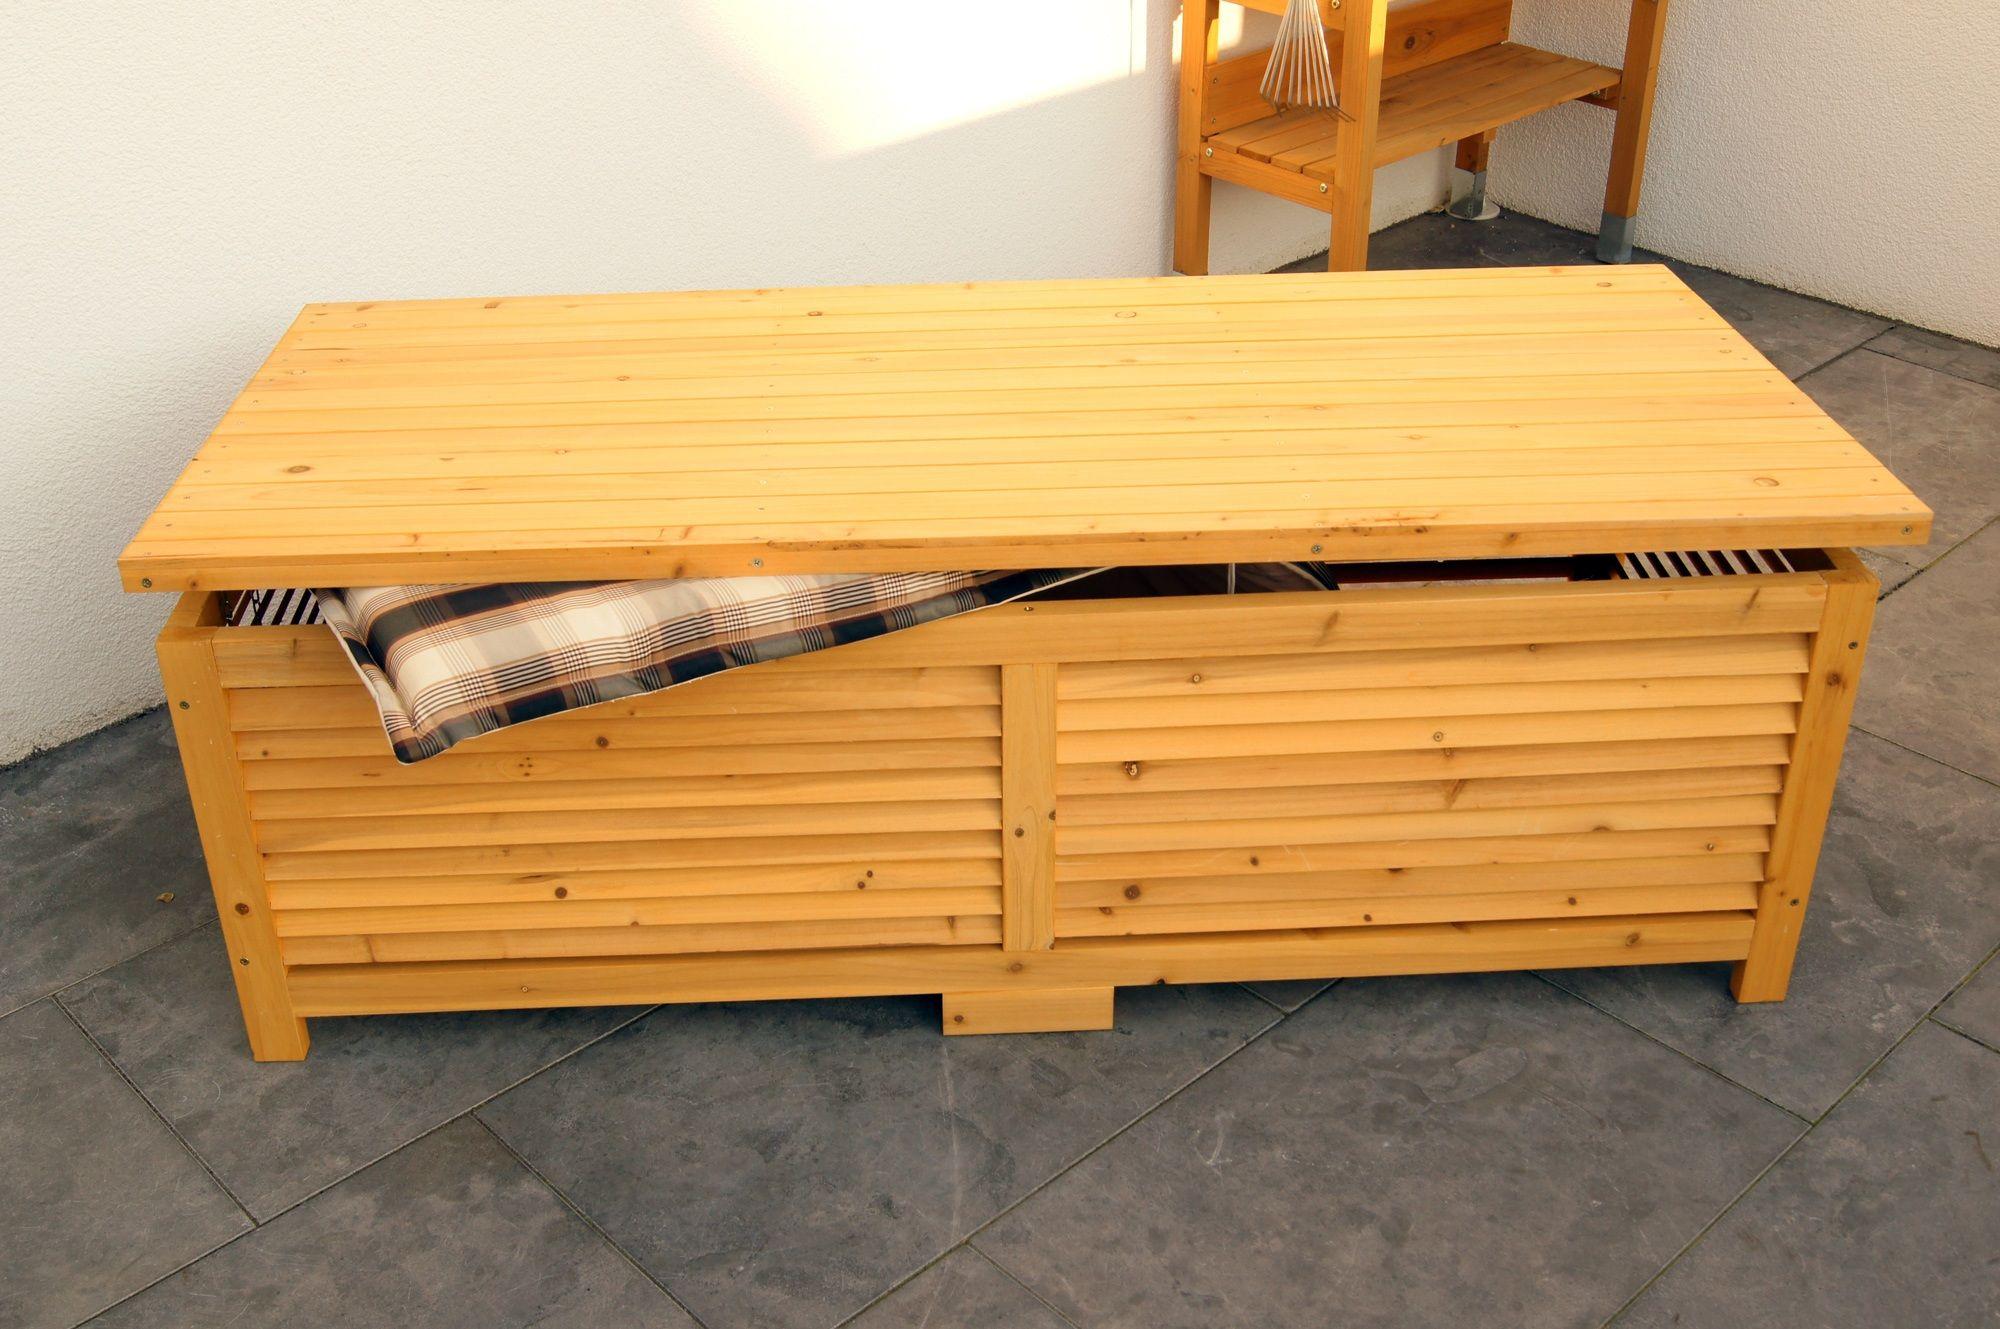 Holz Auflagenbox Kissenbox Gartenbox Gartentruhe Box Auflagen